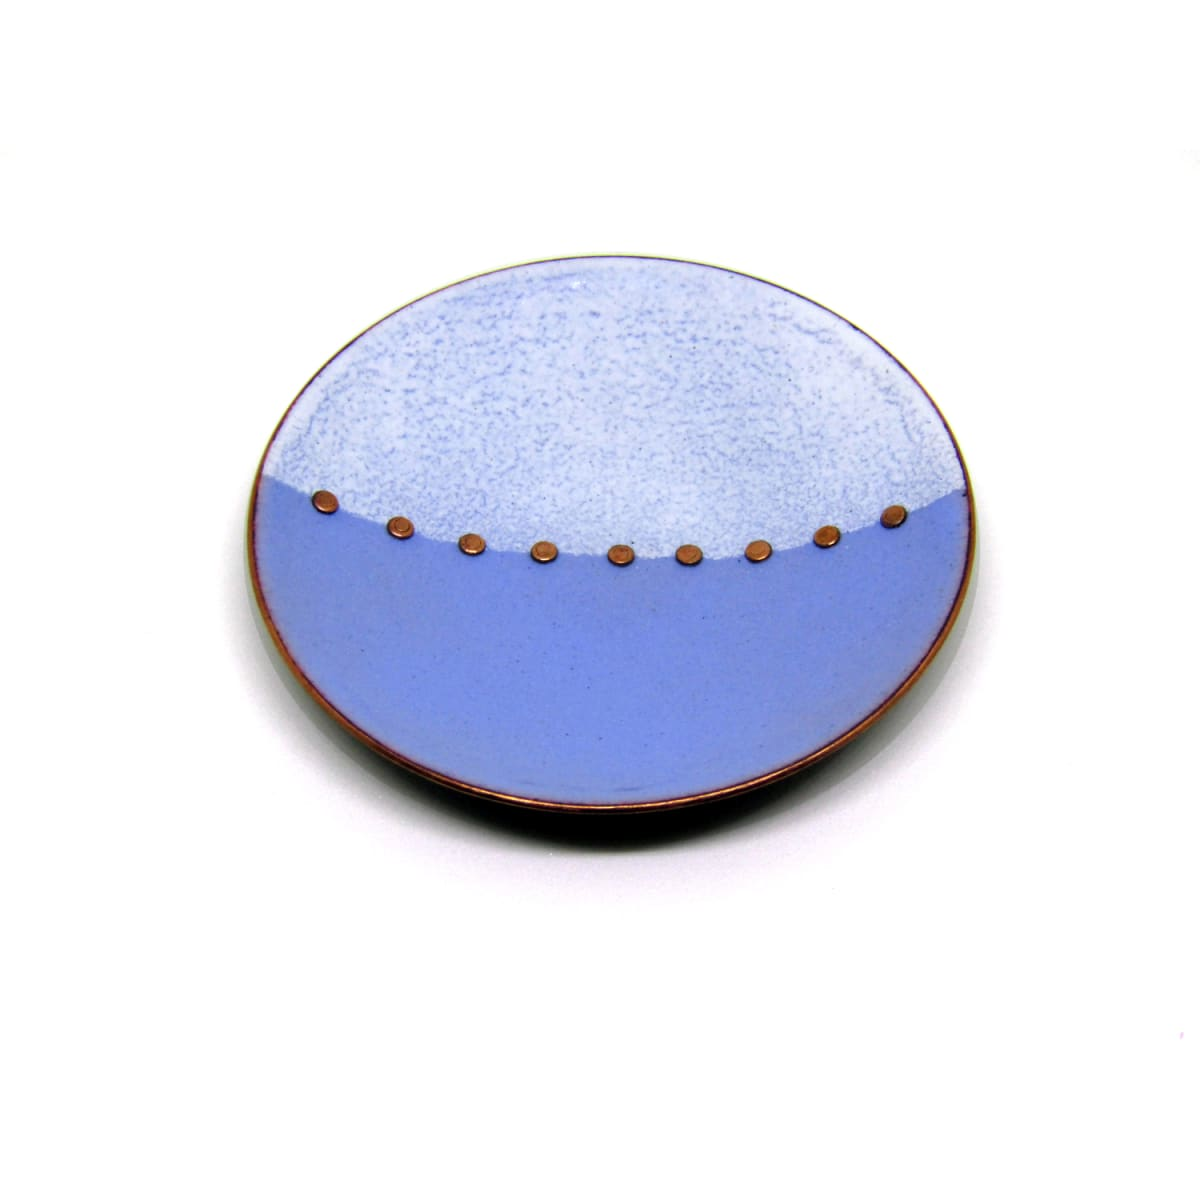 MCA133, Blue White Trinket Dish by Anne McArdle